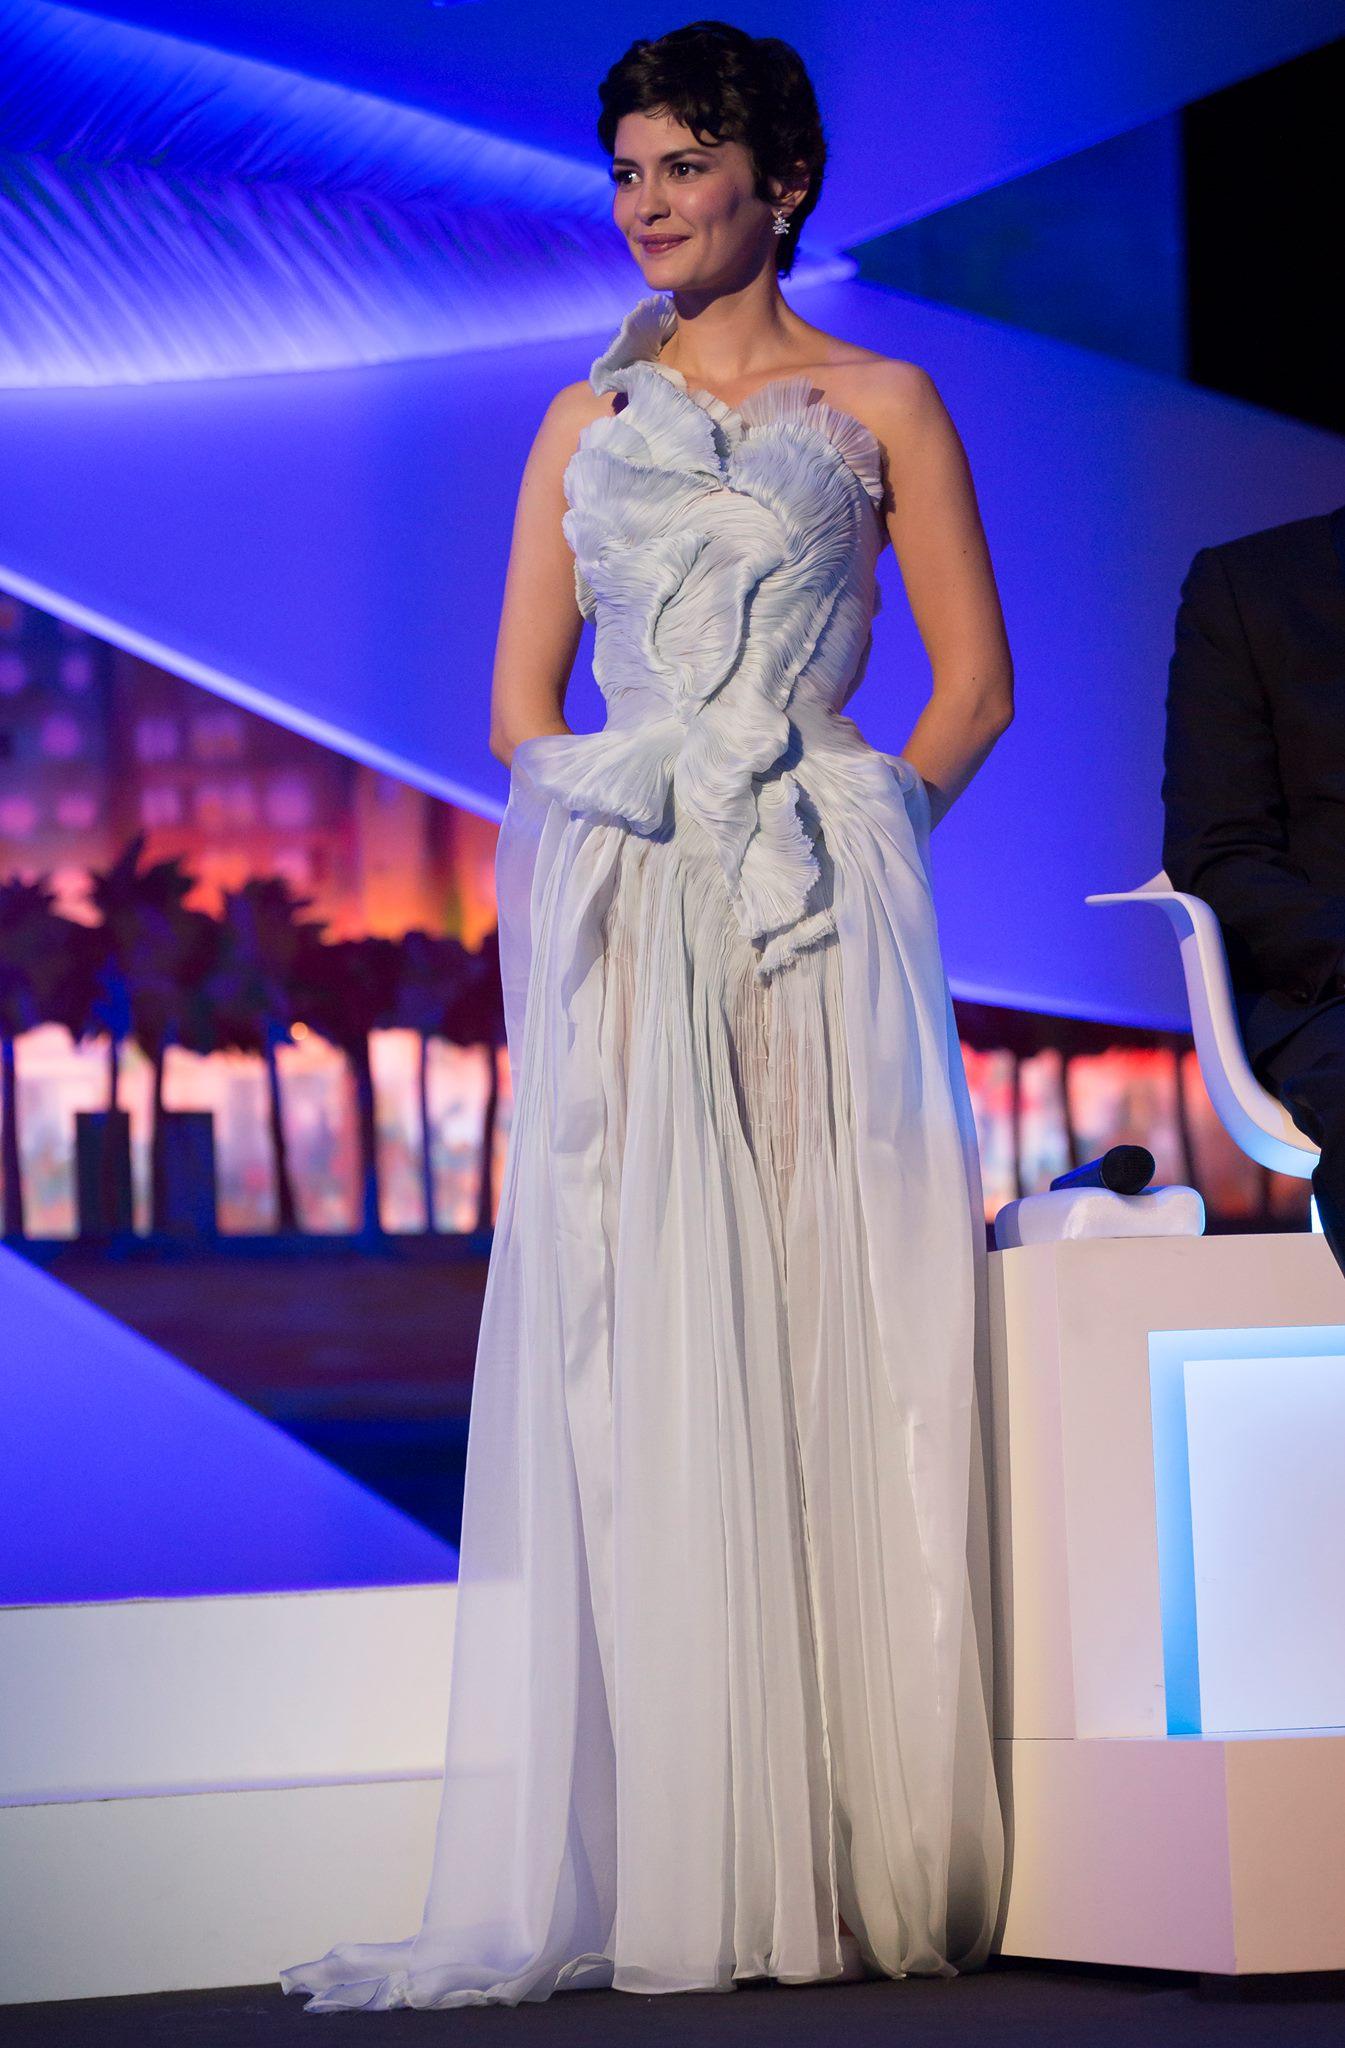 Audrey Tautou Wearing Absinthe from Yiqing Yin